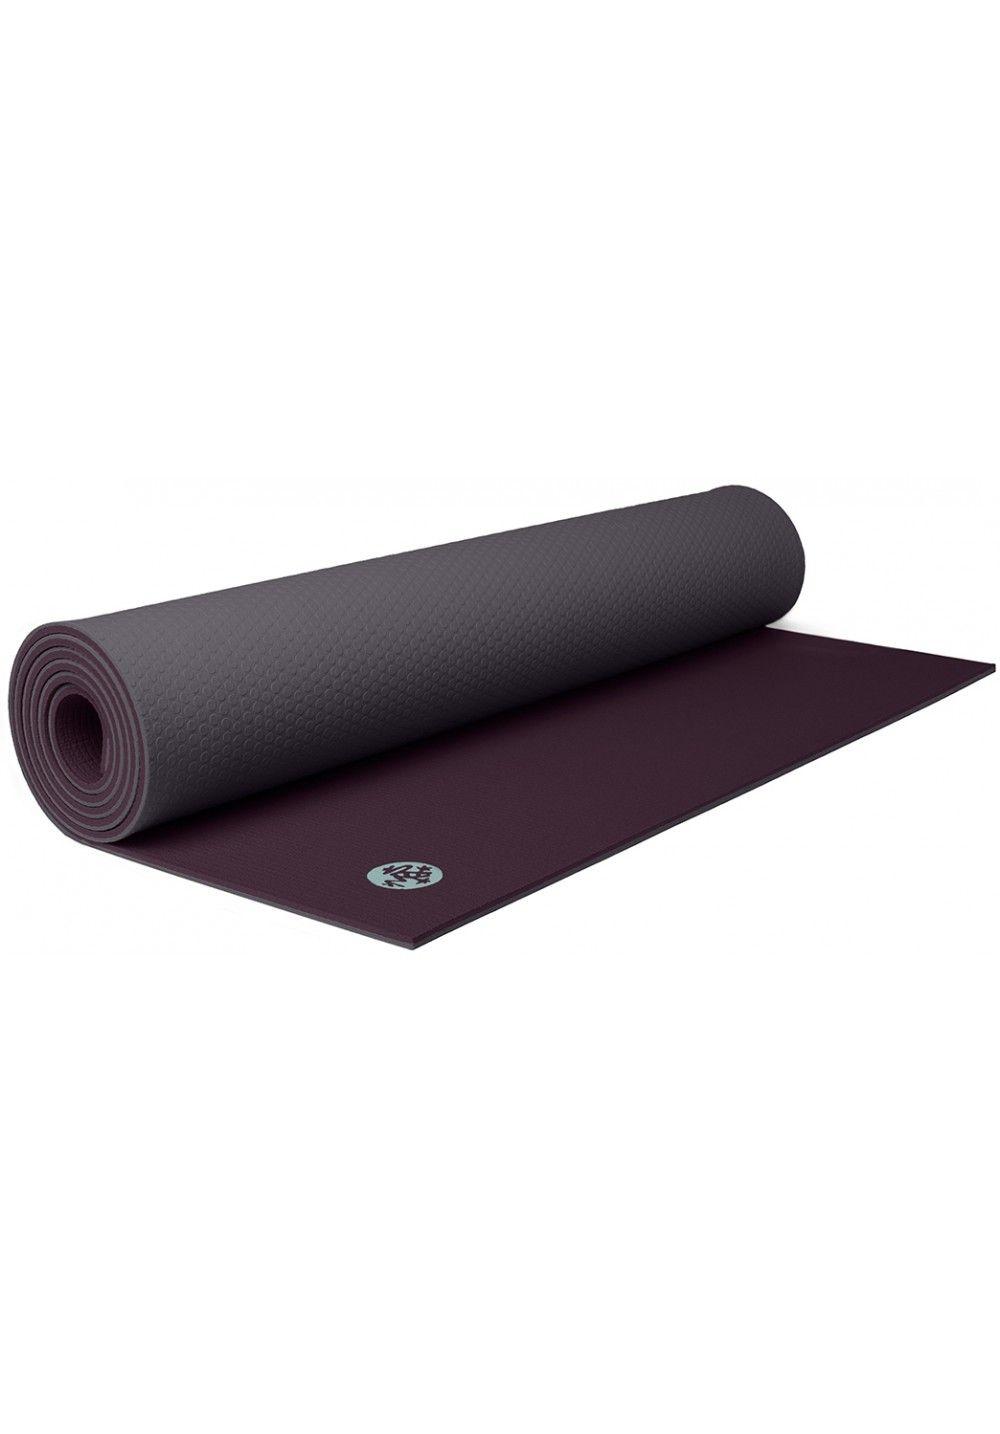 Manduka Yoga Mat Pro Limited Edition Vasuda With Images Manduka Yoga Mat Yoga Mat Yoga Meditation Inspiration